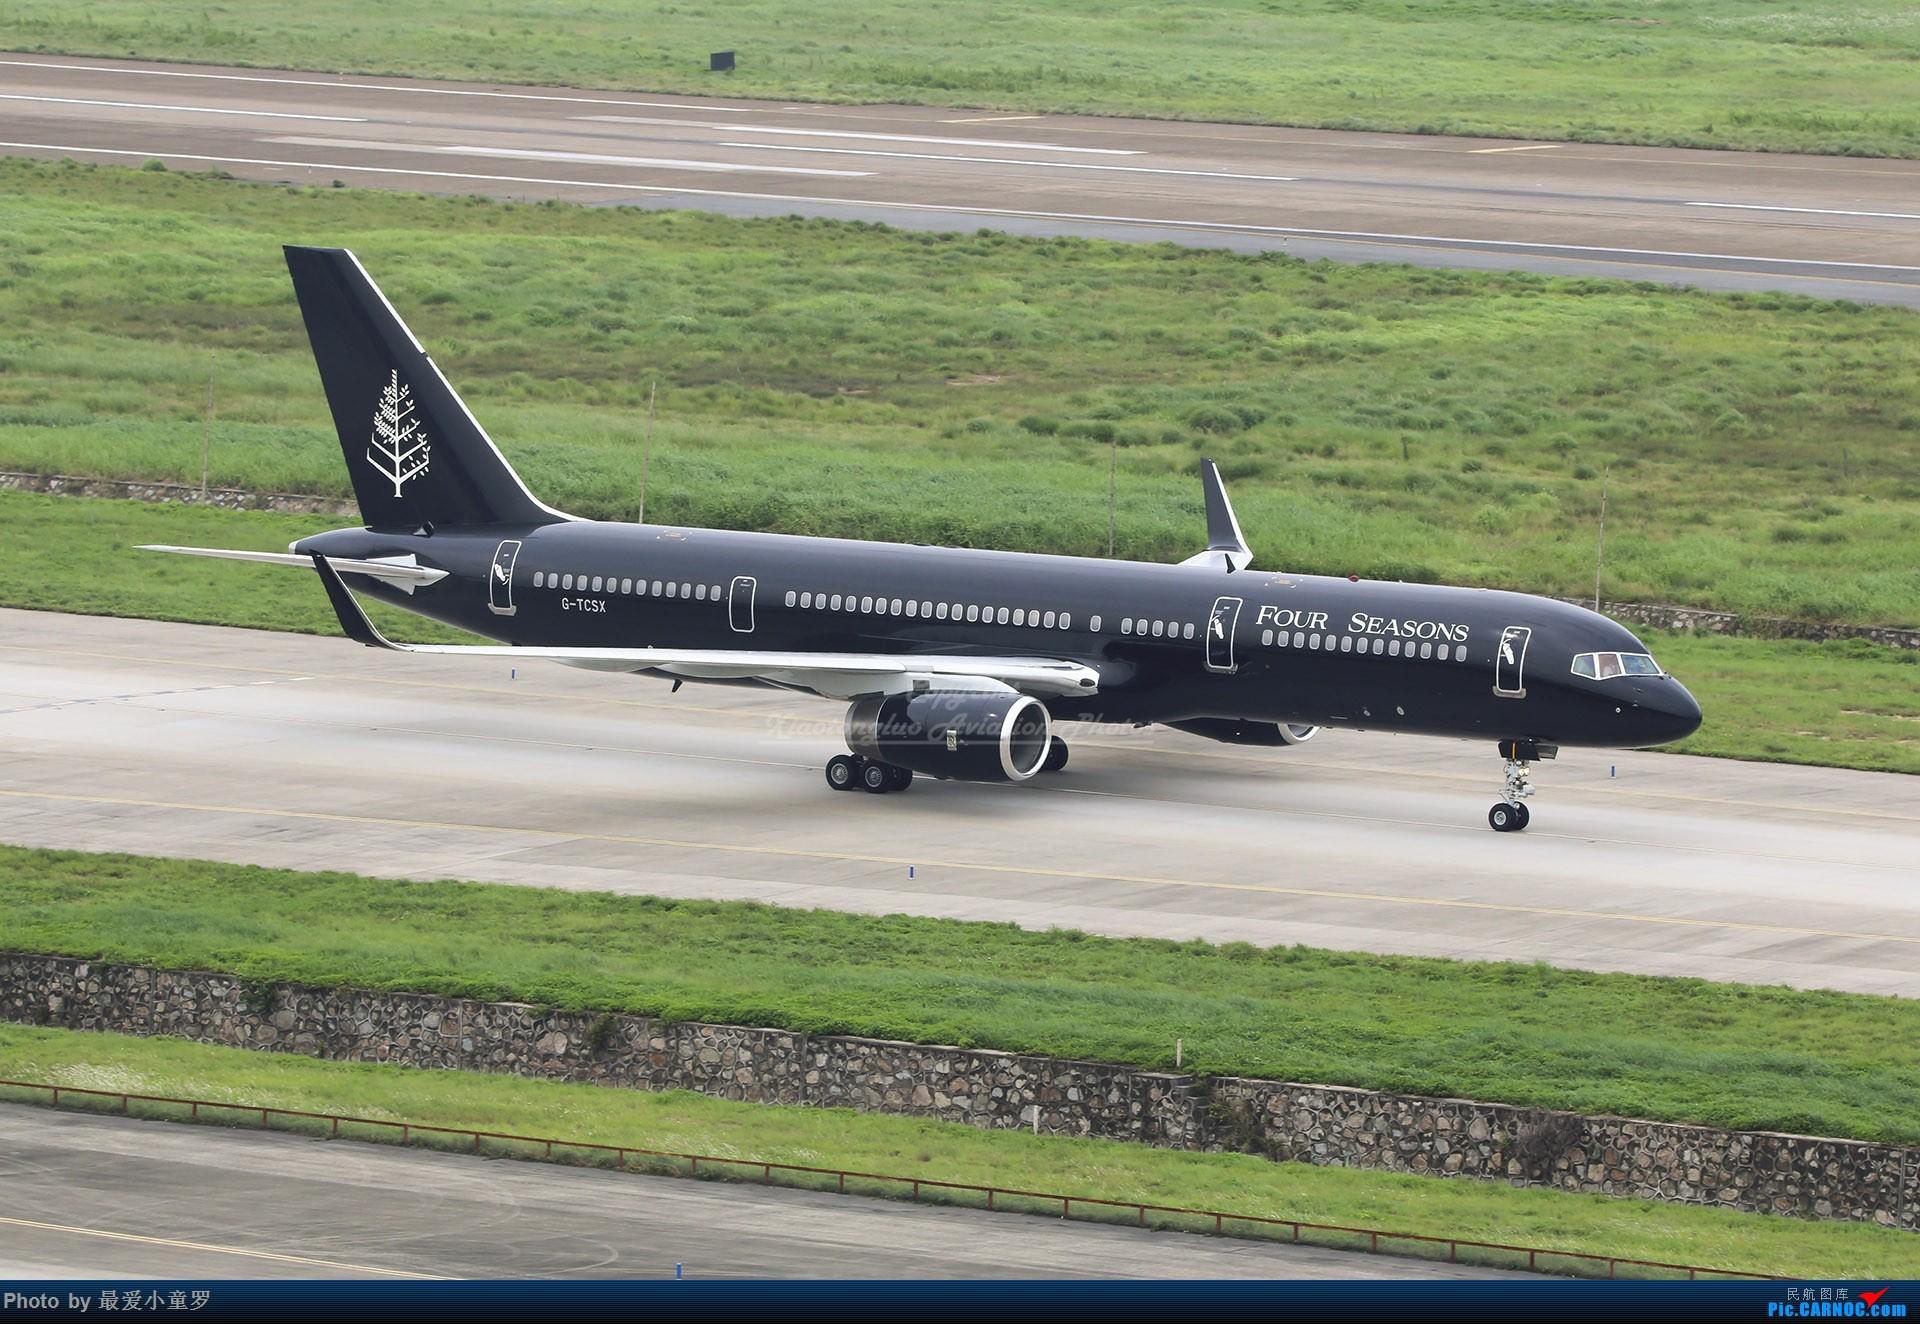 Re:[原创]2013-2018,系列组图纪念拍机5周年 BOEING 757-200 G-TCSX 中国深圳宝安国际机场